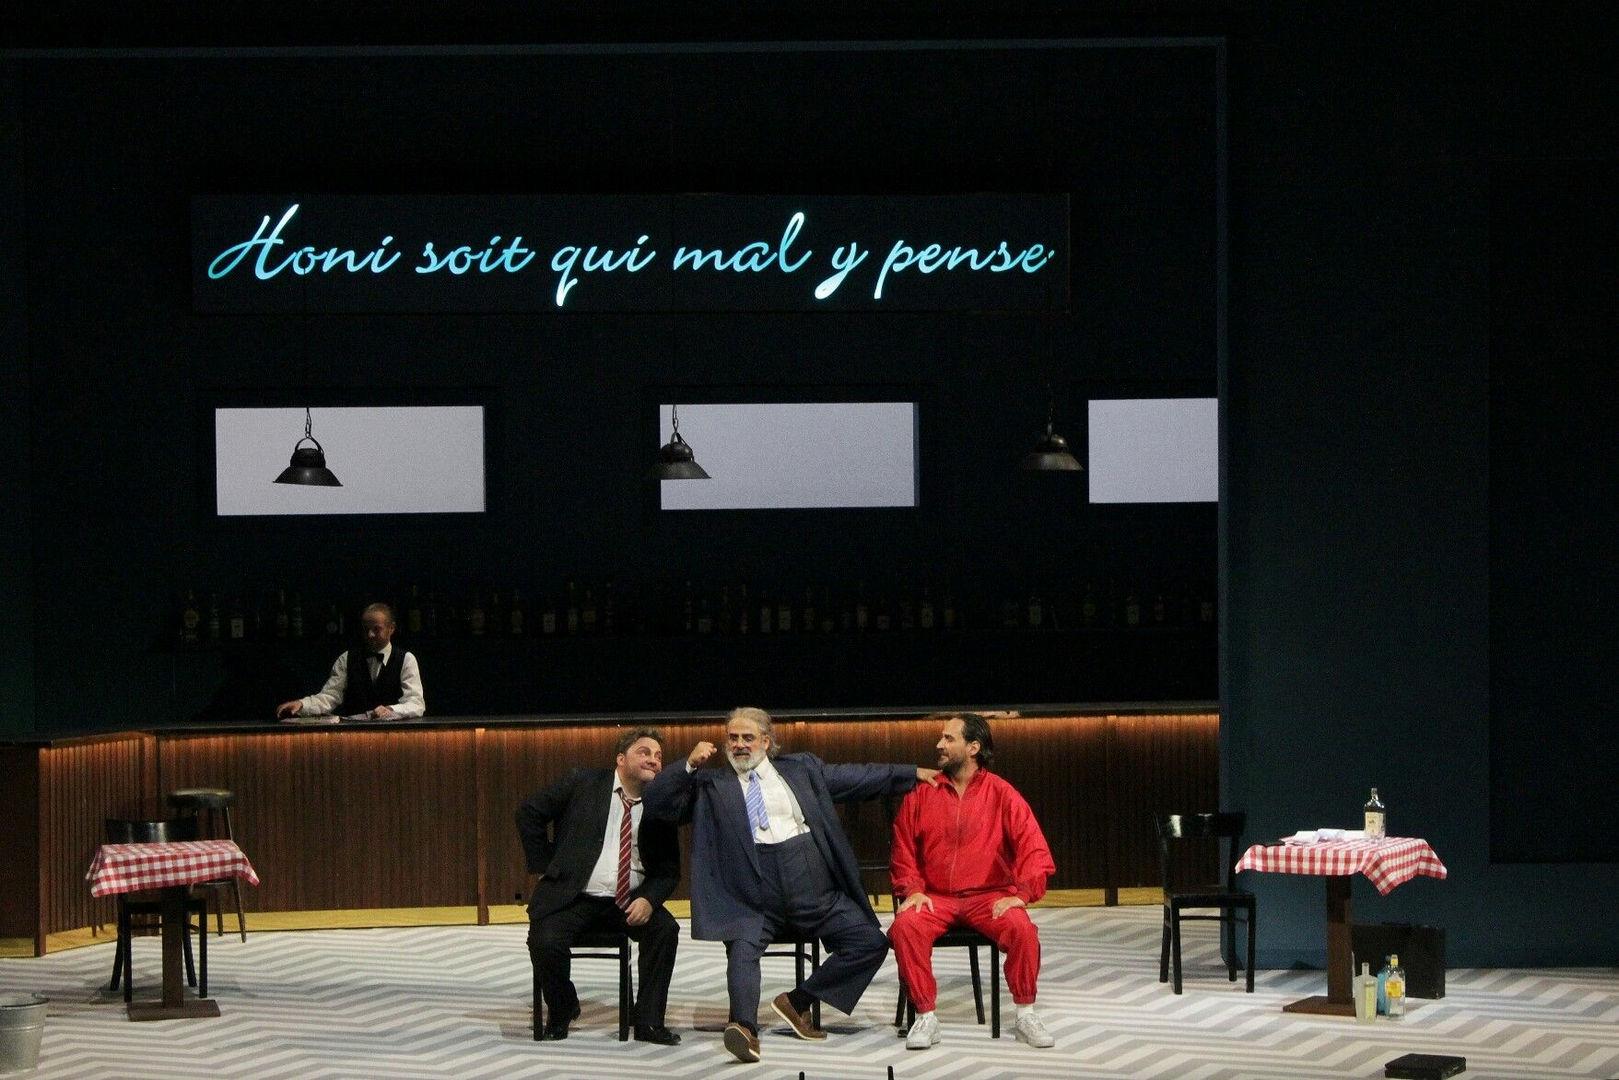 Falstaff-Opera-by-Giuseppe-Verdi-directed-by-Jacopo-Spirei- in-Karlsruhe-3